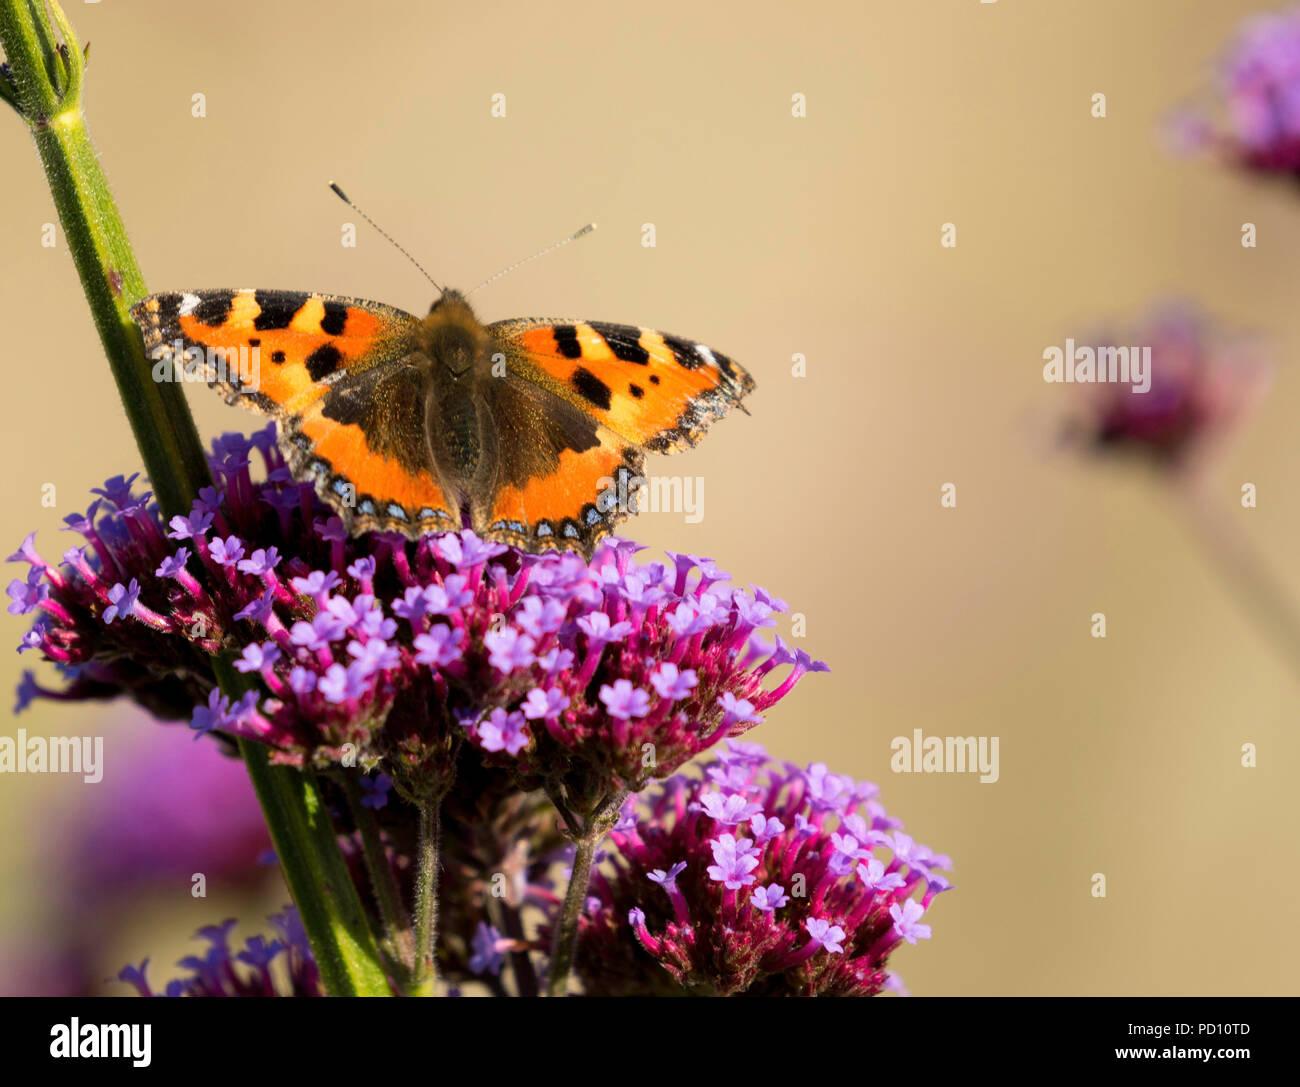 Tortoise Shell Butterfly resting on a purple Verbena bonariensis flower. - Stock Image